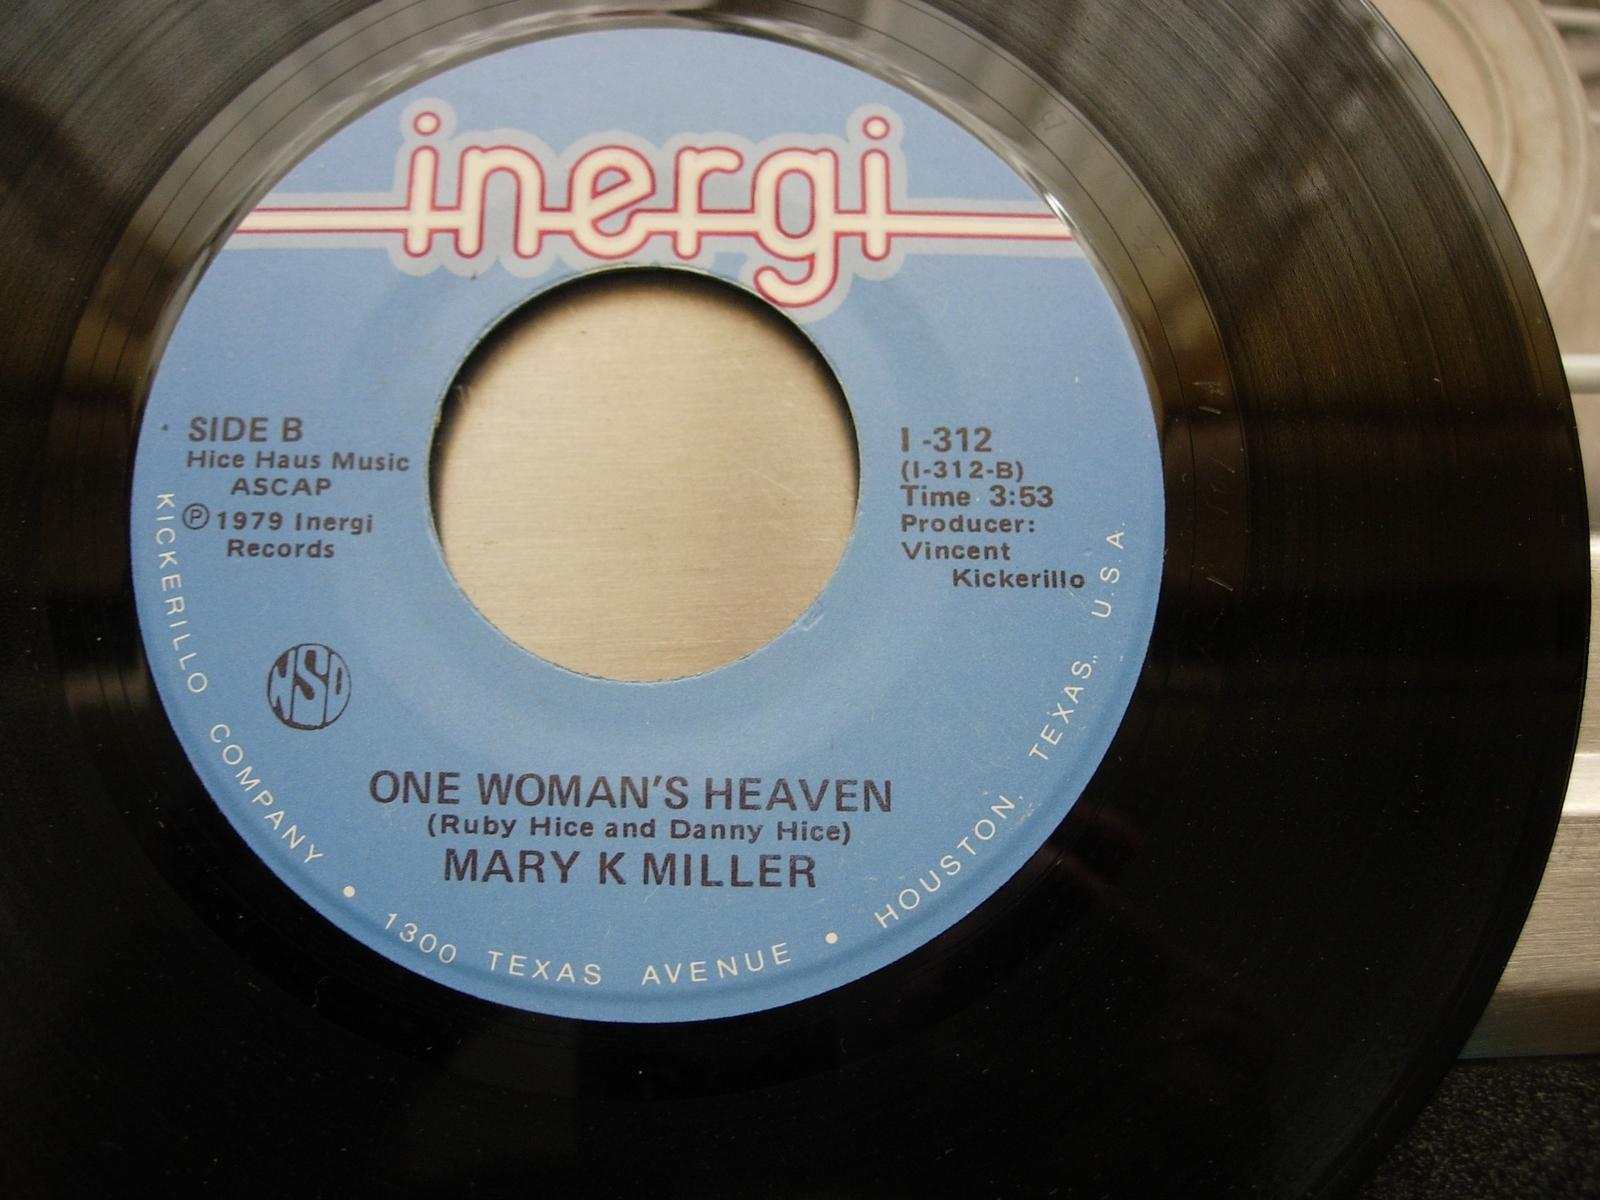 Mary K. Miller - Next Best Feeling / One Woman's Heaven - Inergi I-312